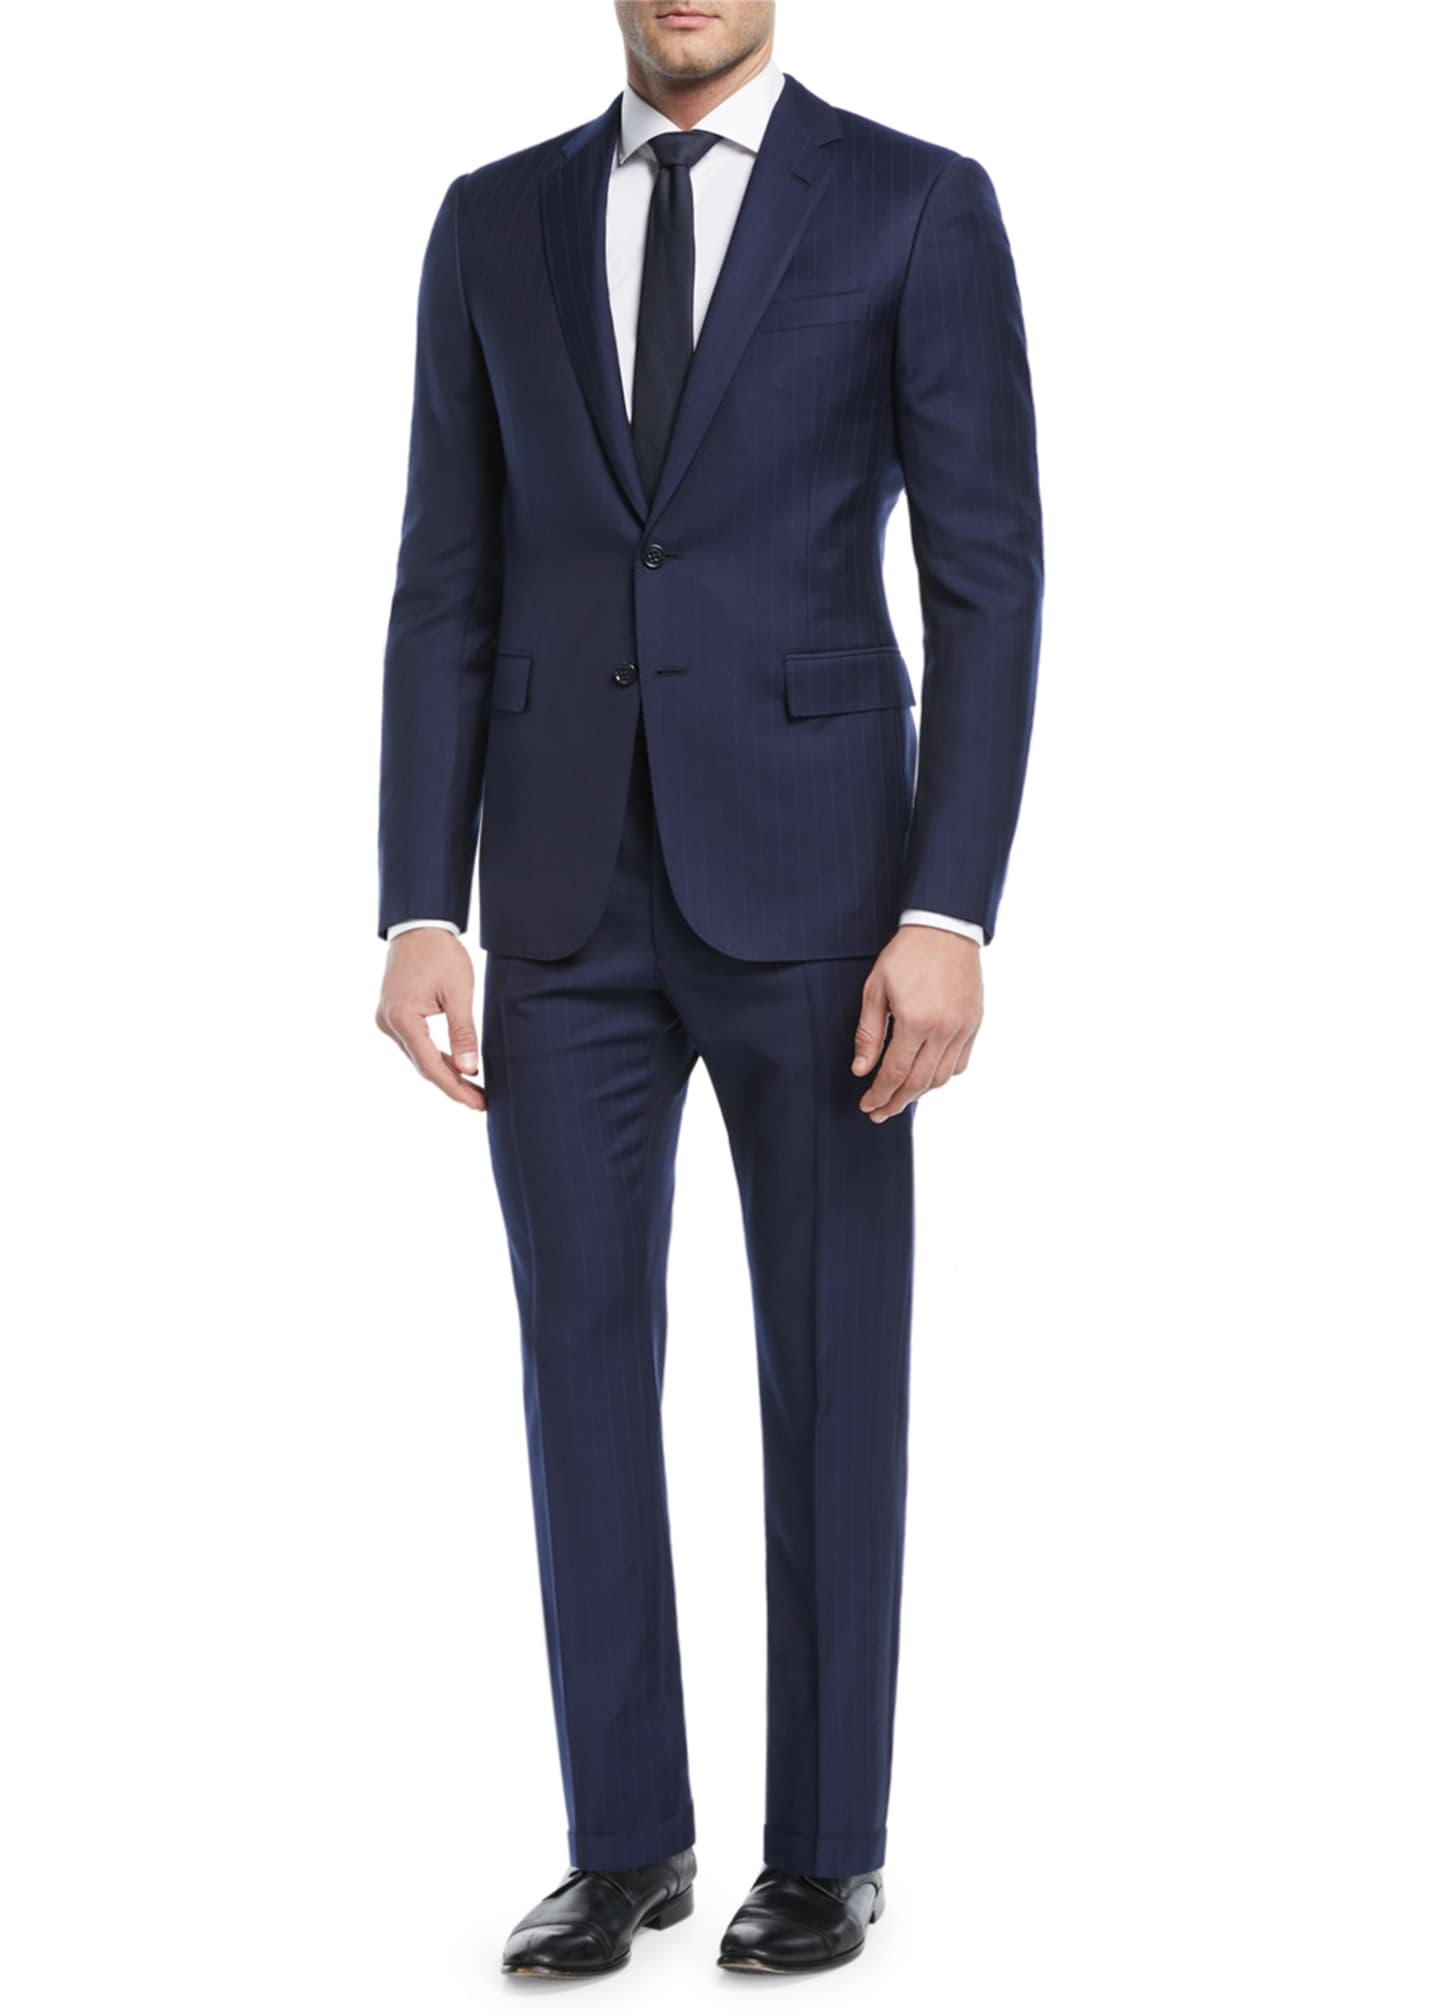 Ralph Lauren Railroad Striped Twill Two-Piece Suit